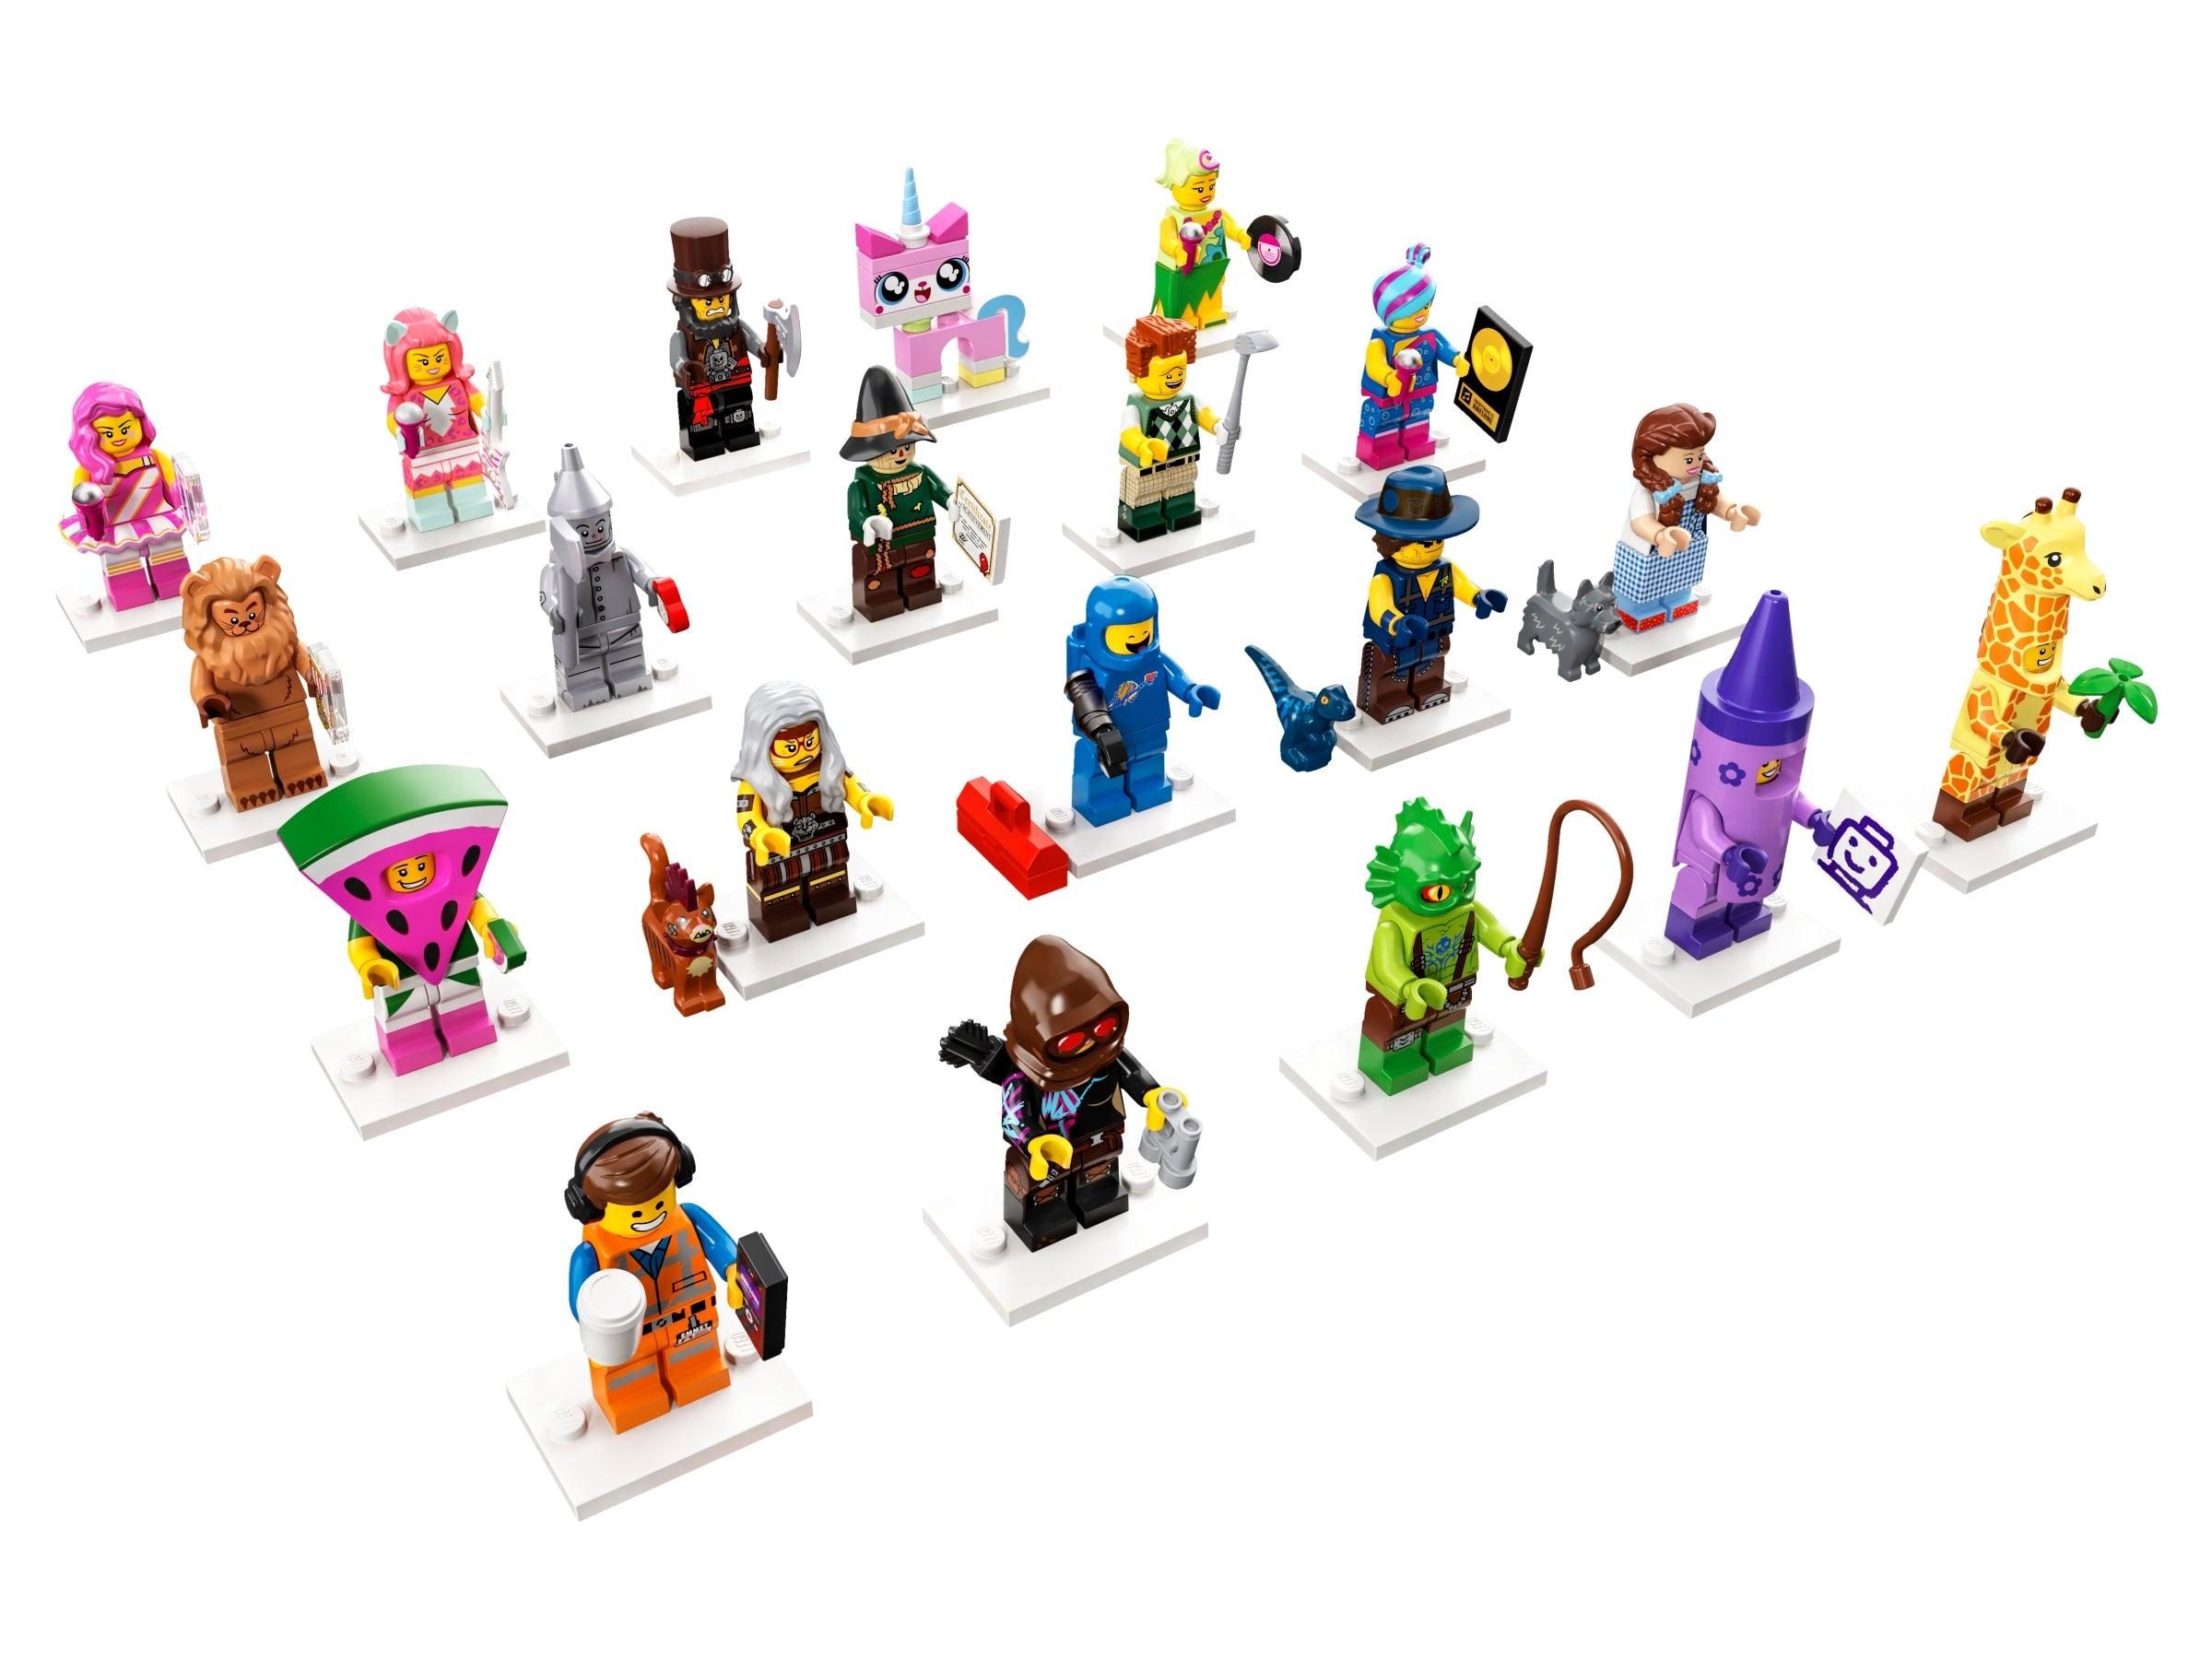 Lego The Lego Movie 2 Wildstyle Minifigure